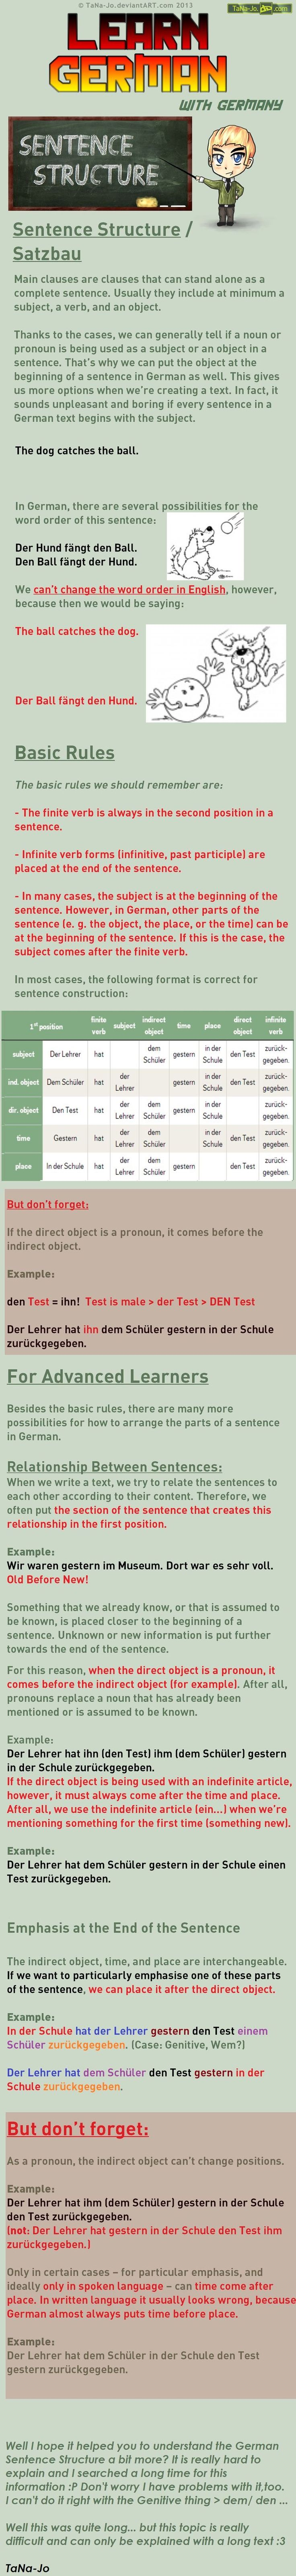 108 best deutsch learn images on Pinterest | Languages, Learn german ...